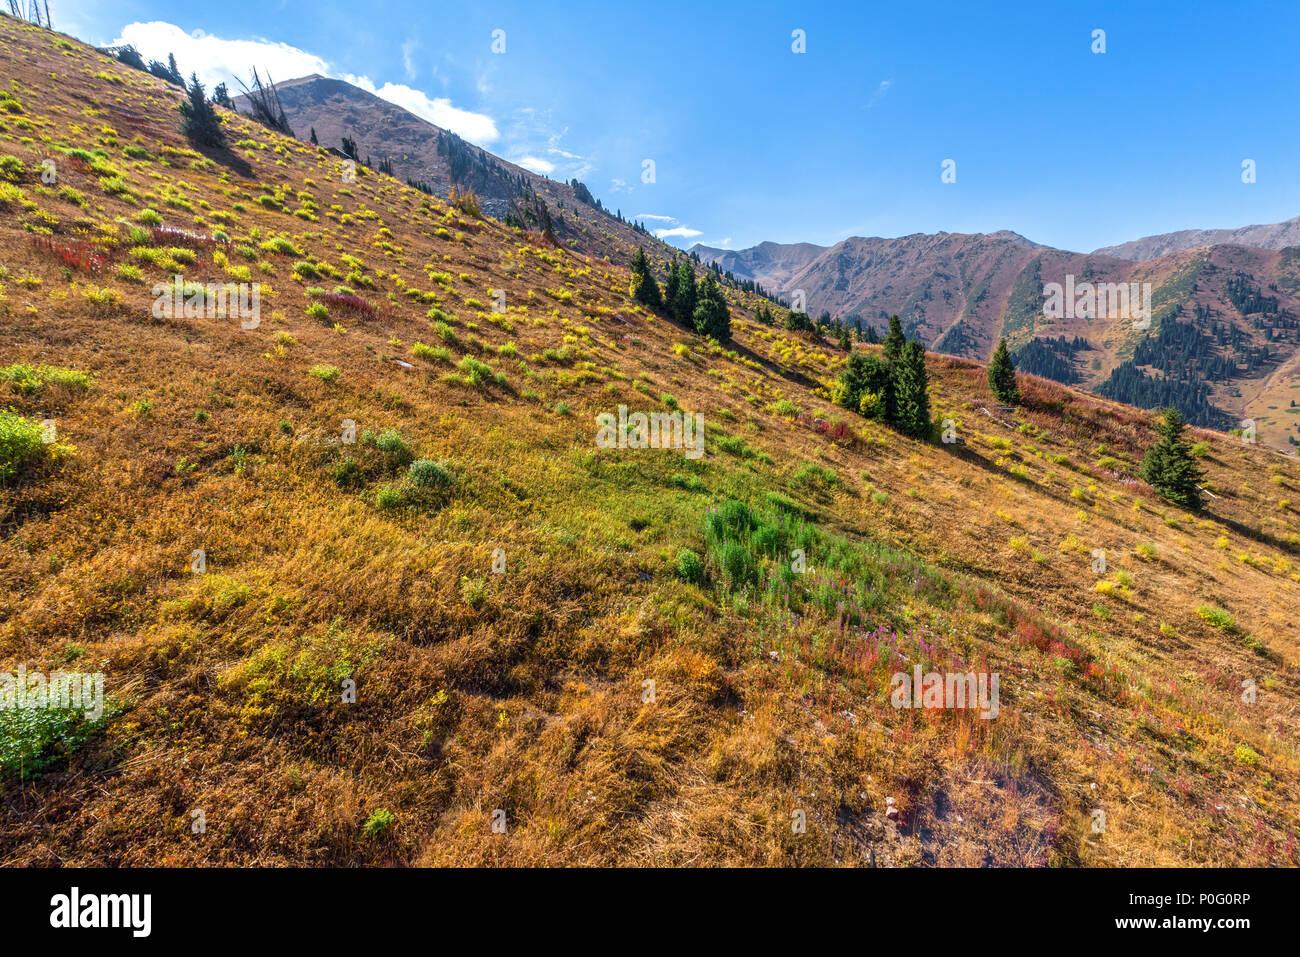 Autumn in Zaiyliskiy Alatau, Kazakstan - Stock Image